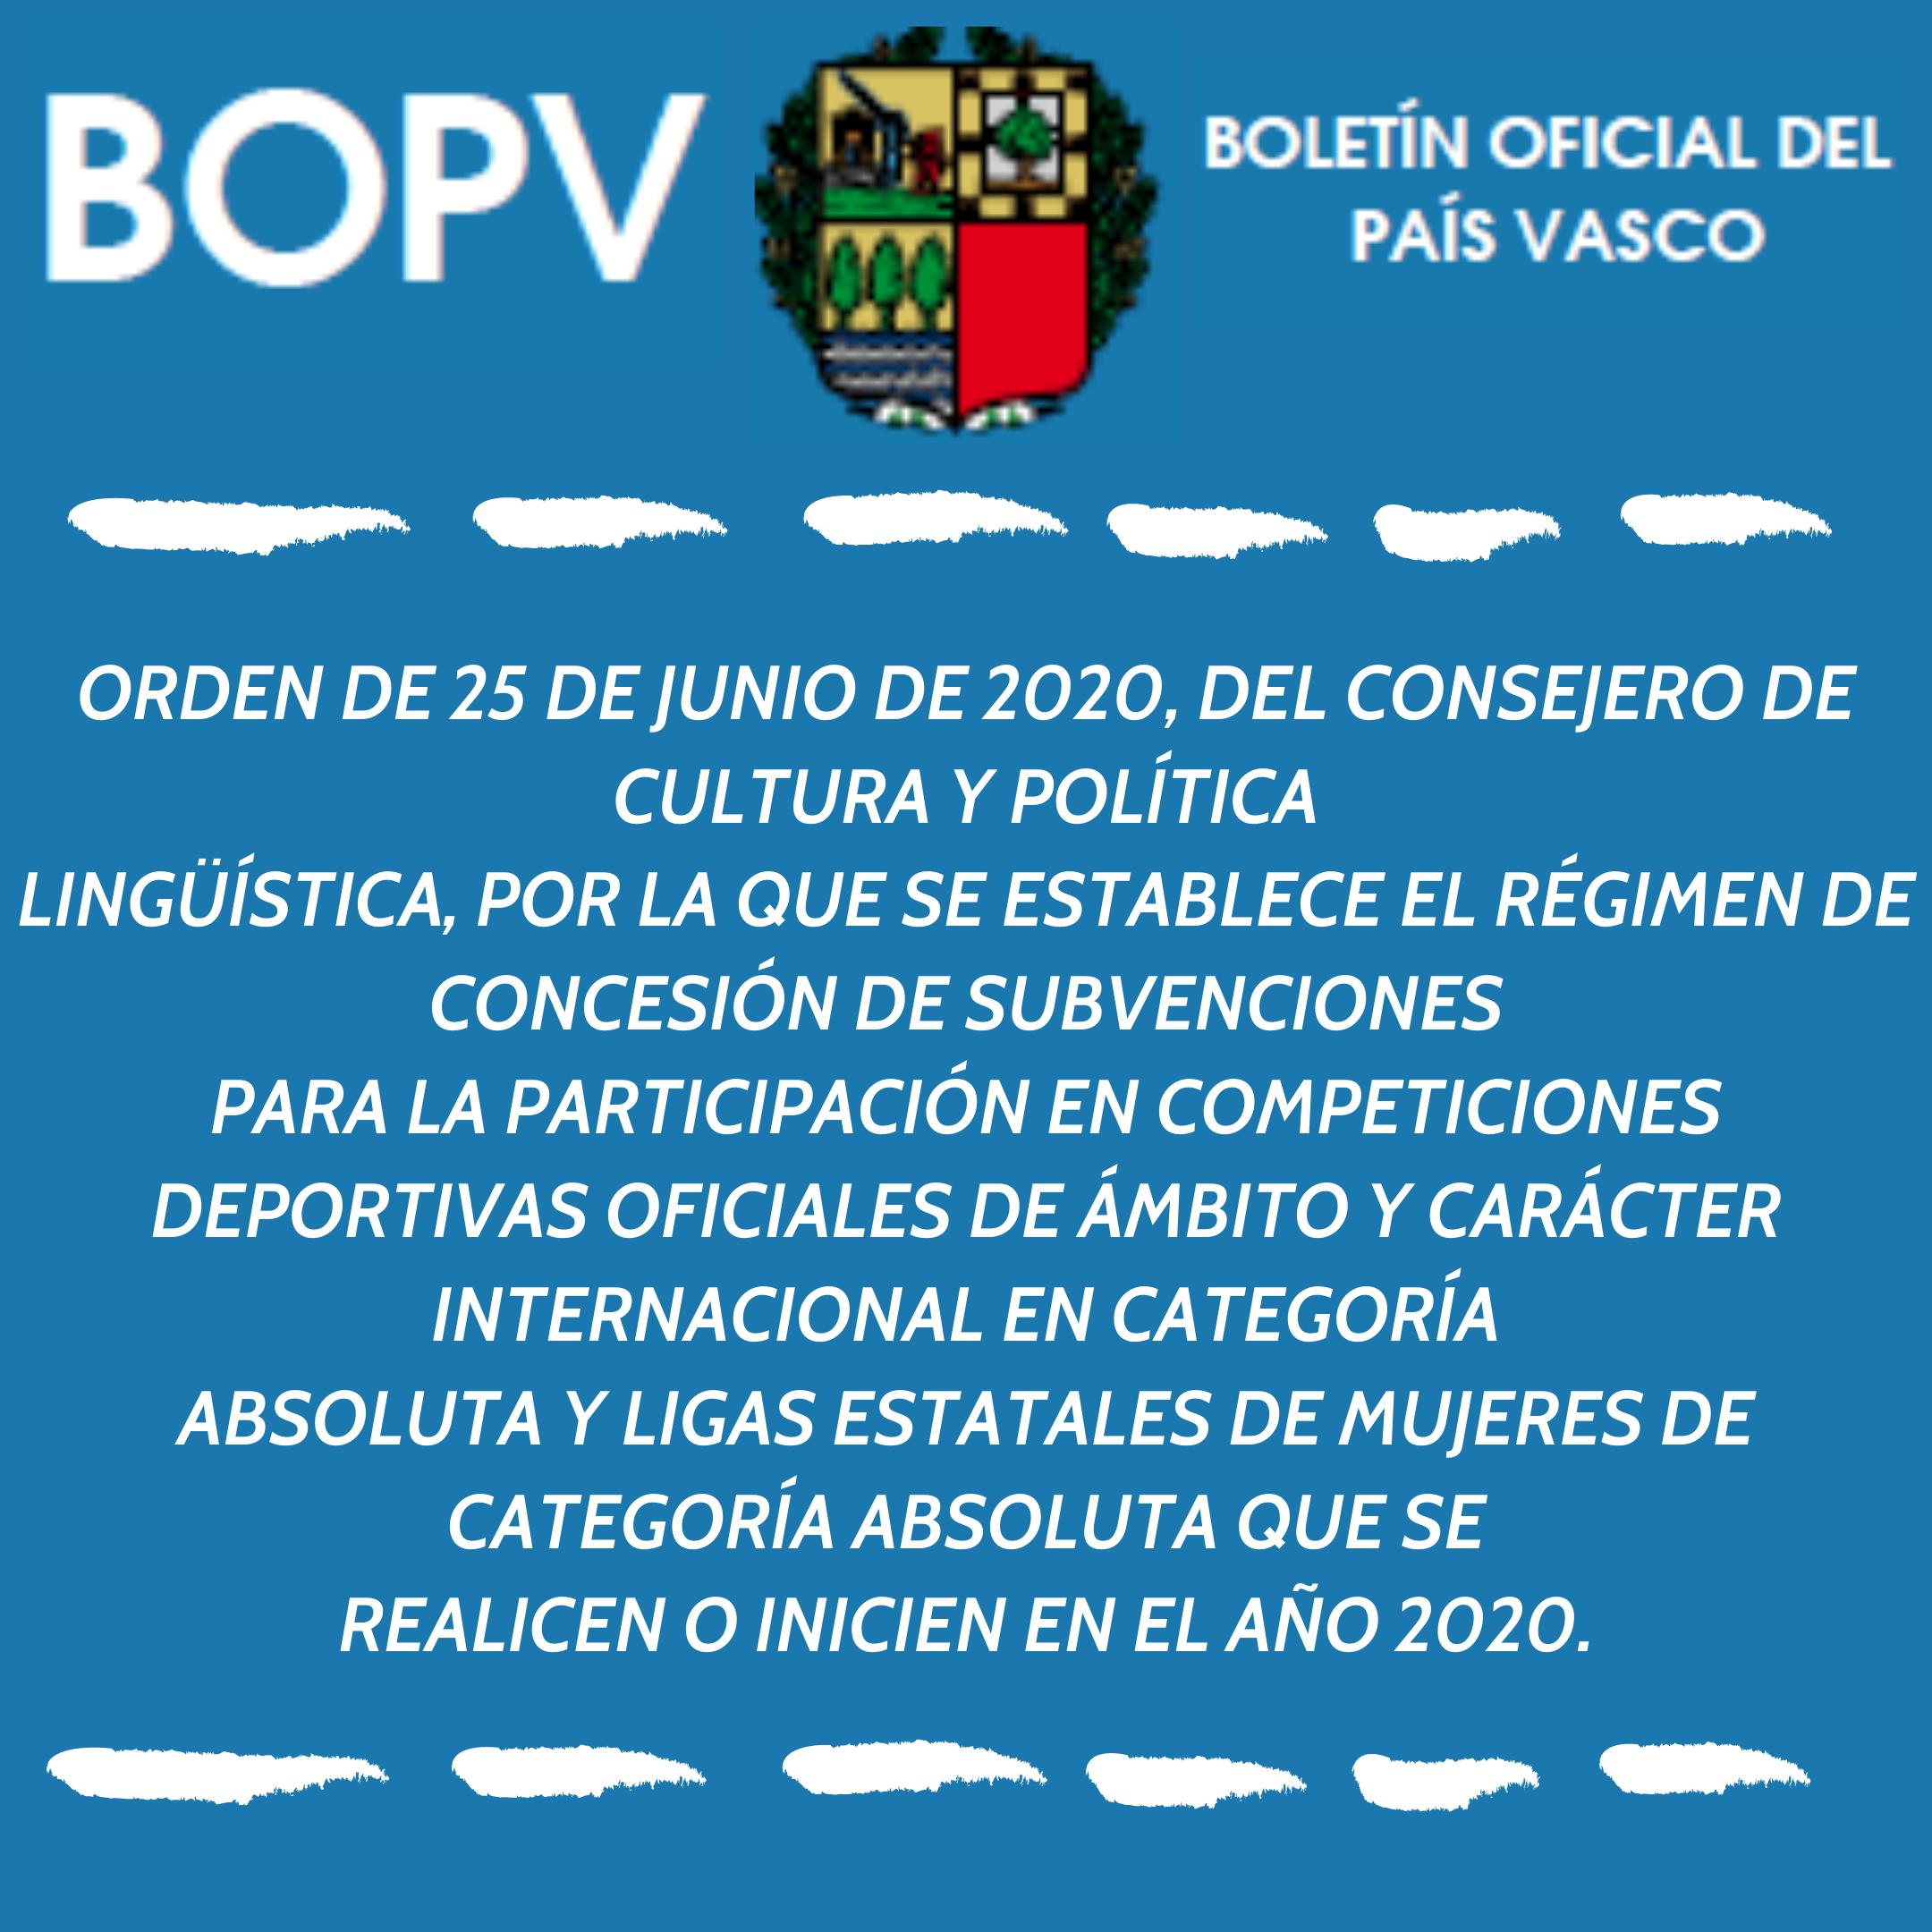 BOPV – 09 JULIO 2020